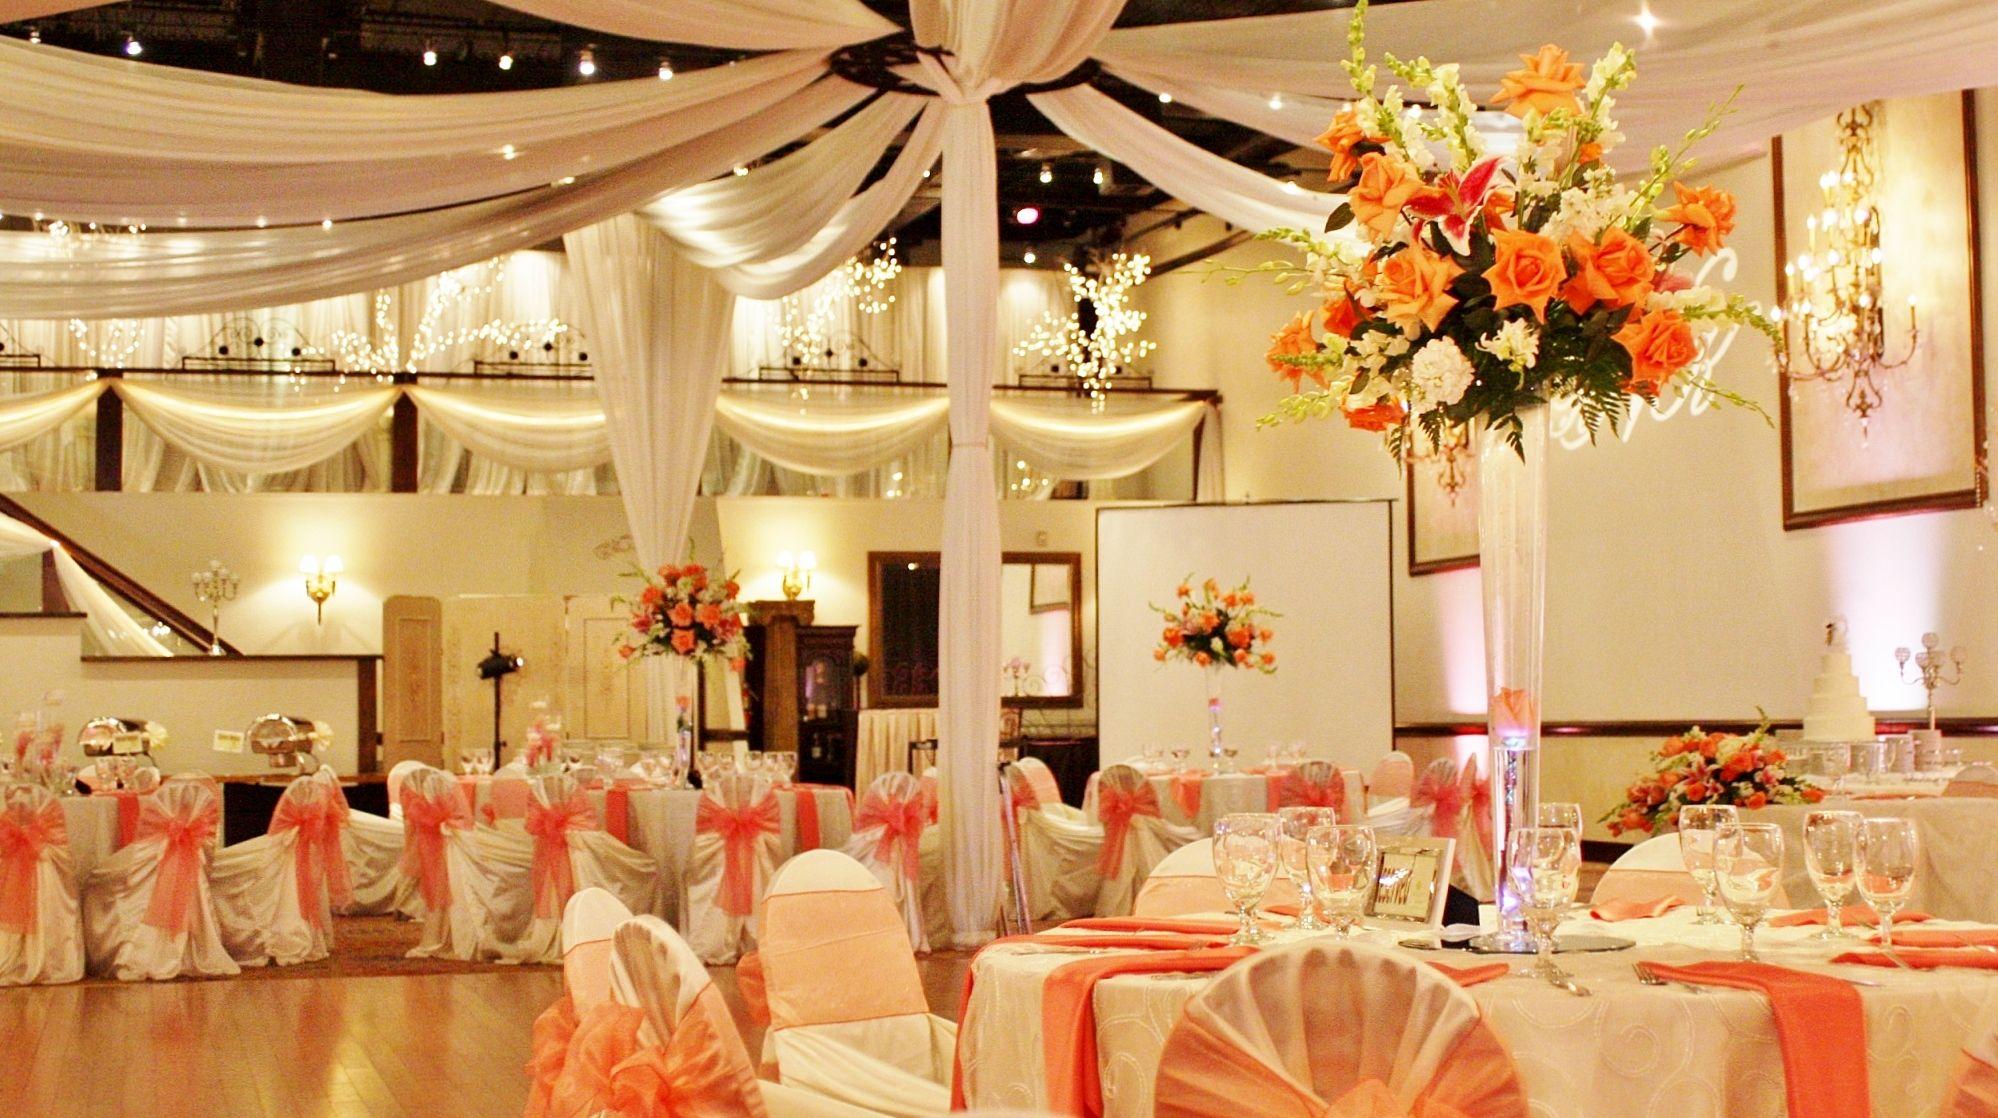 Pelazzio Full Service Wedding Venue Can Help Create The Ceremony